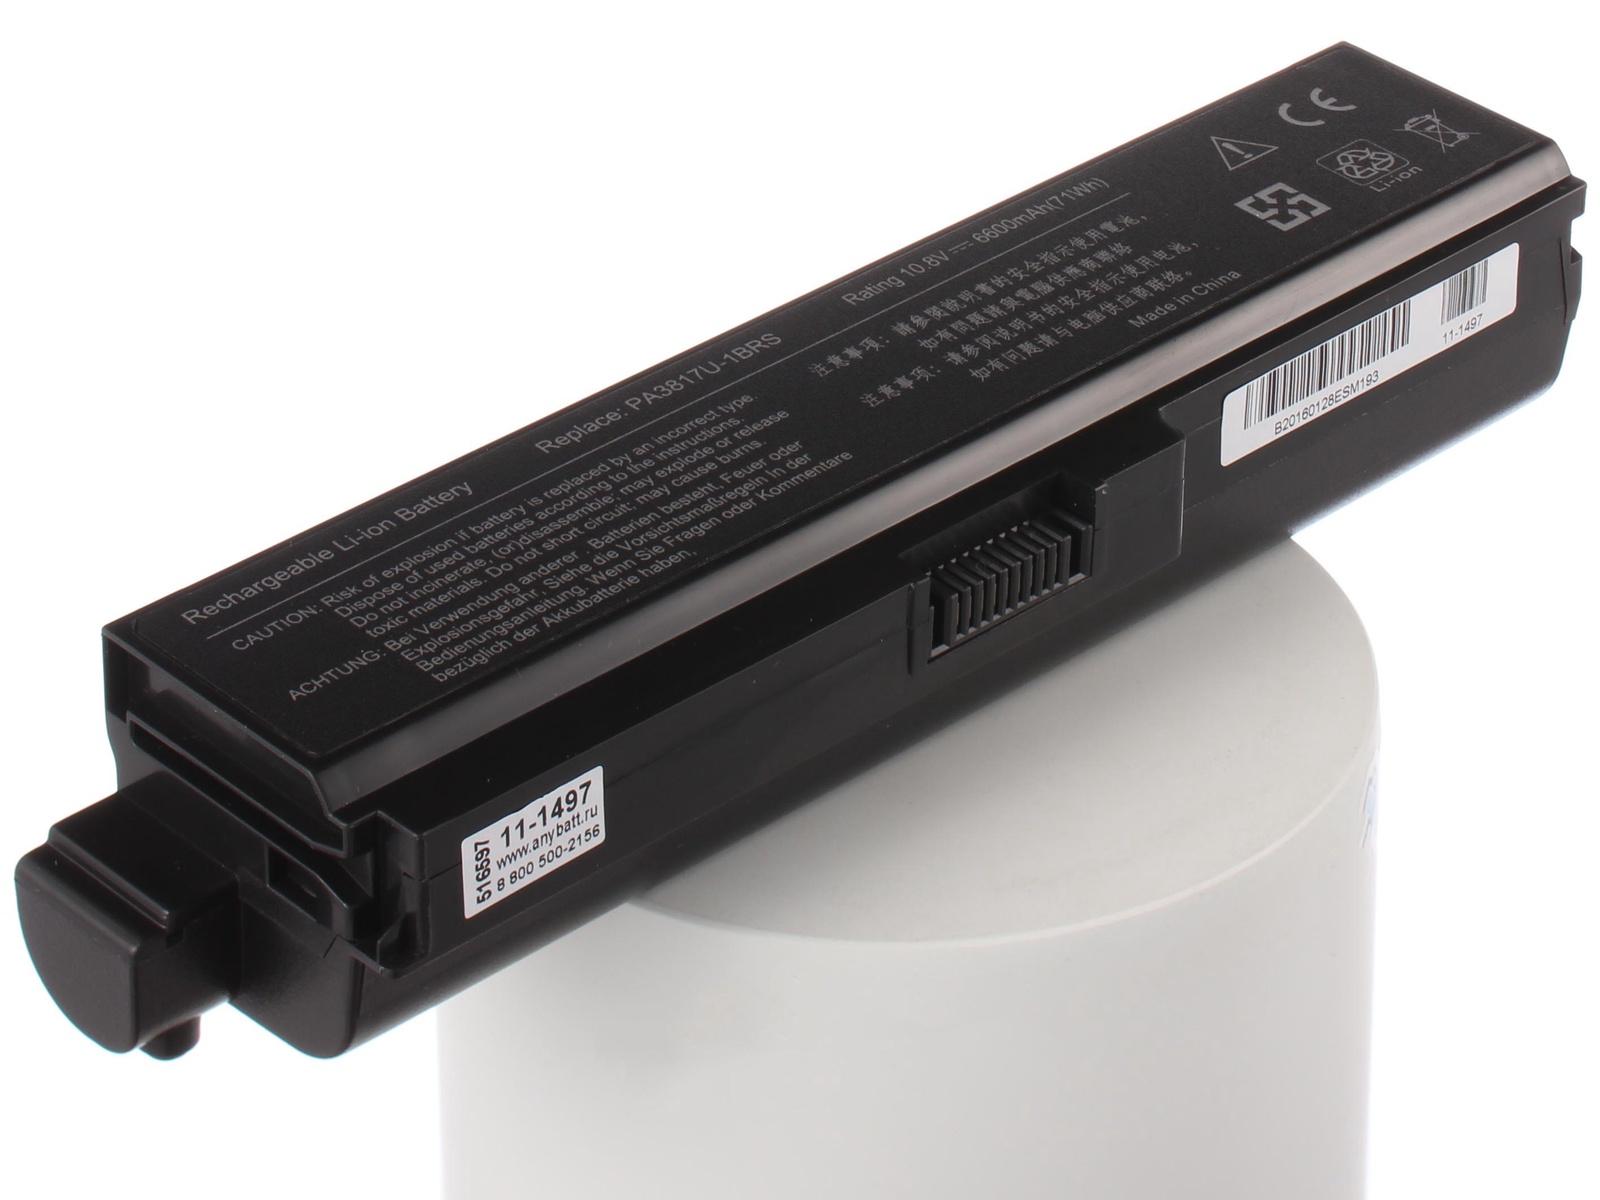 Аккумулятор для ноутбука AnyBatt ToshiBa PA3817U-1BRS аккумуляторная батарея ibatt ib a497h 7800 мач совместима с toshiba pa3817u 1brs pa3816u 1brs pabas228 pa3819u 1brs pabas230 pabas227 pabas229 pa3819u 1bas pa3817u 1bas pa3818u 1brs pa3818u 1bas